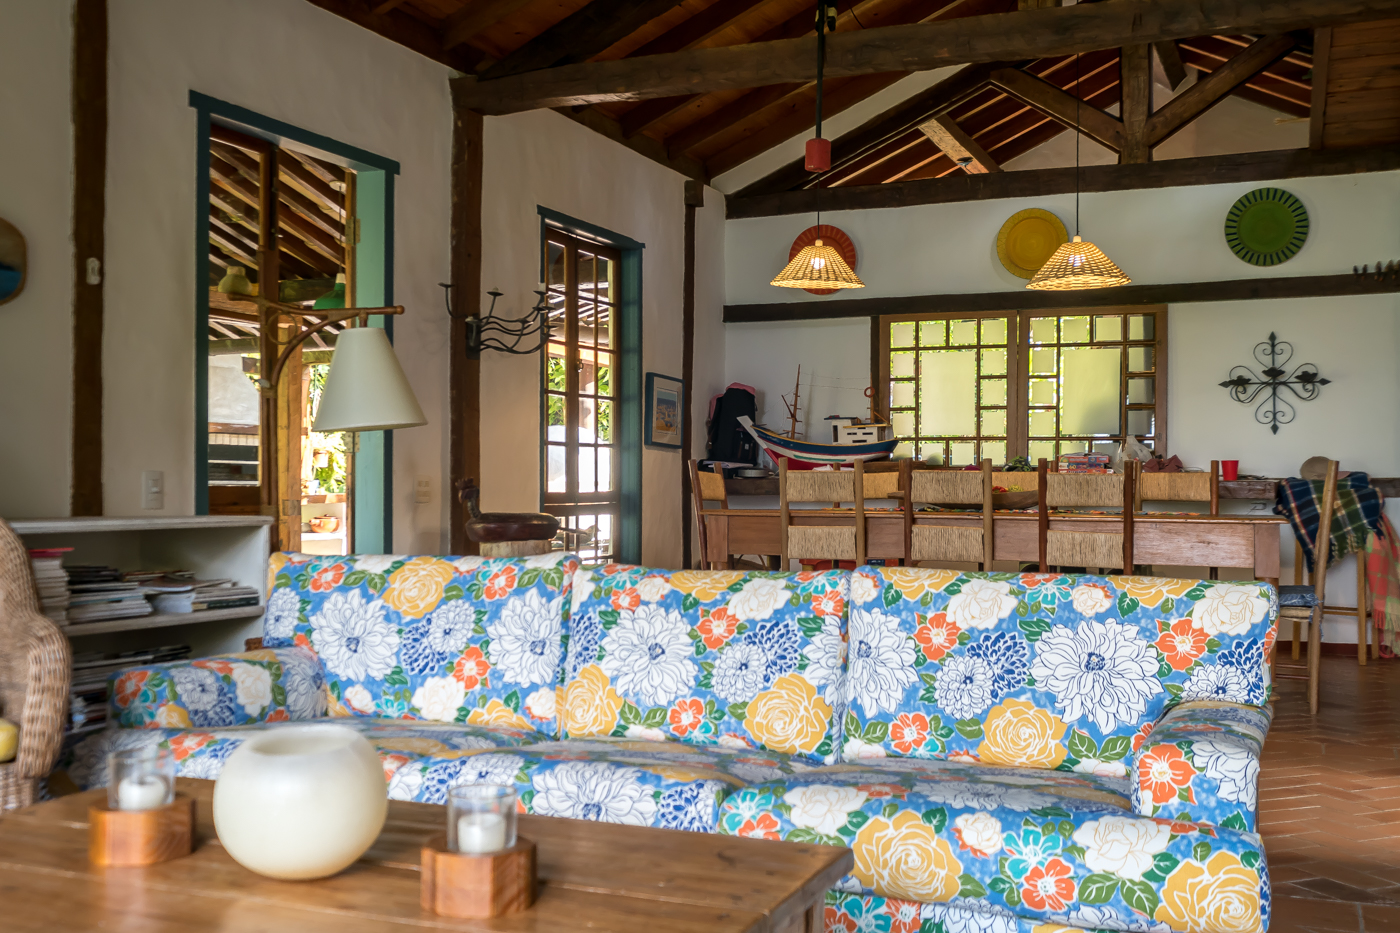 Ubatuba_airbnb-72.jpg